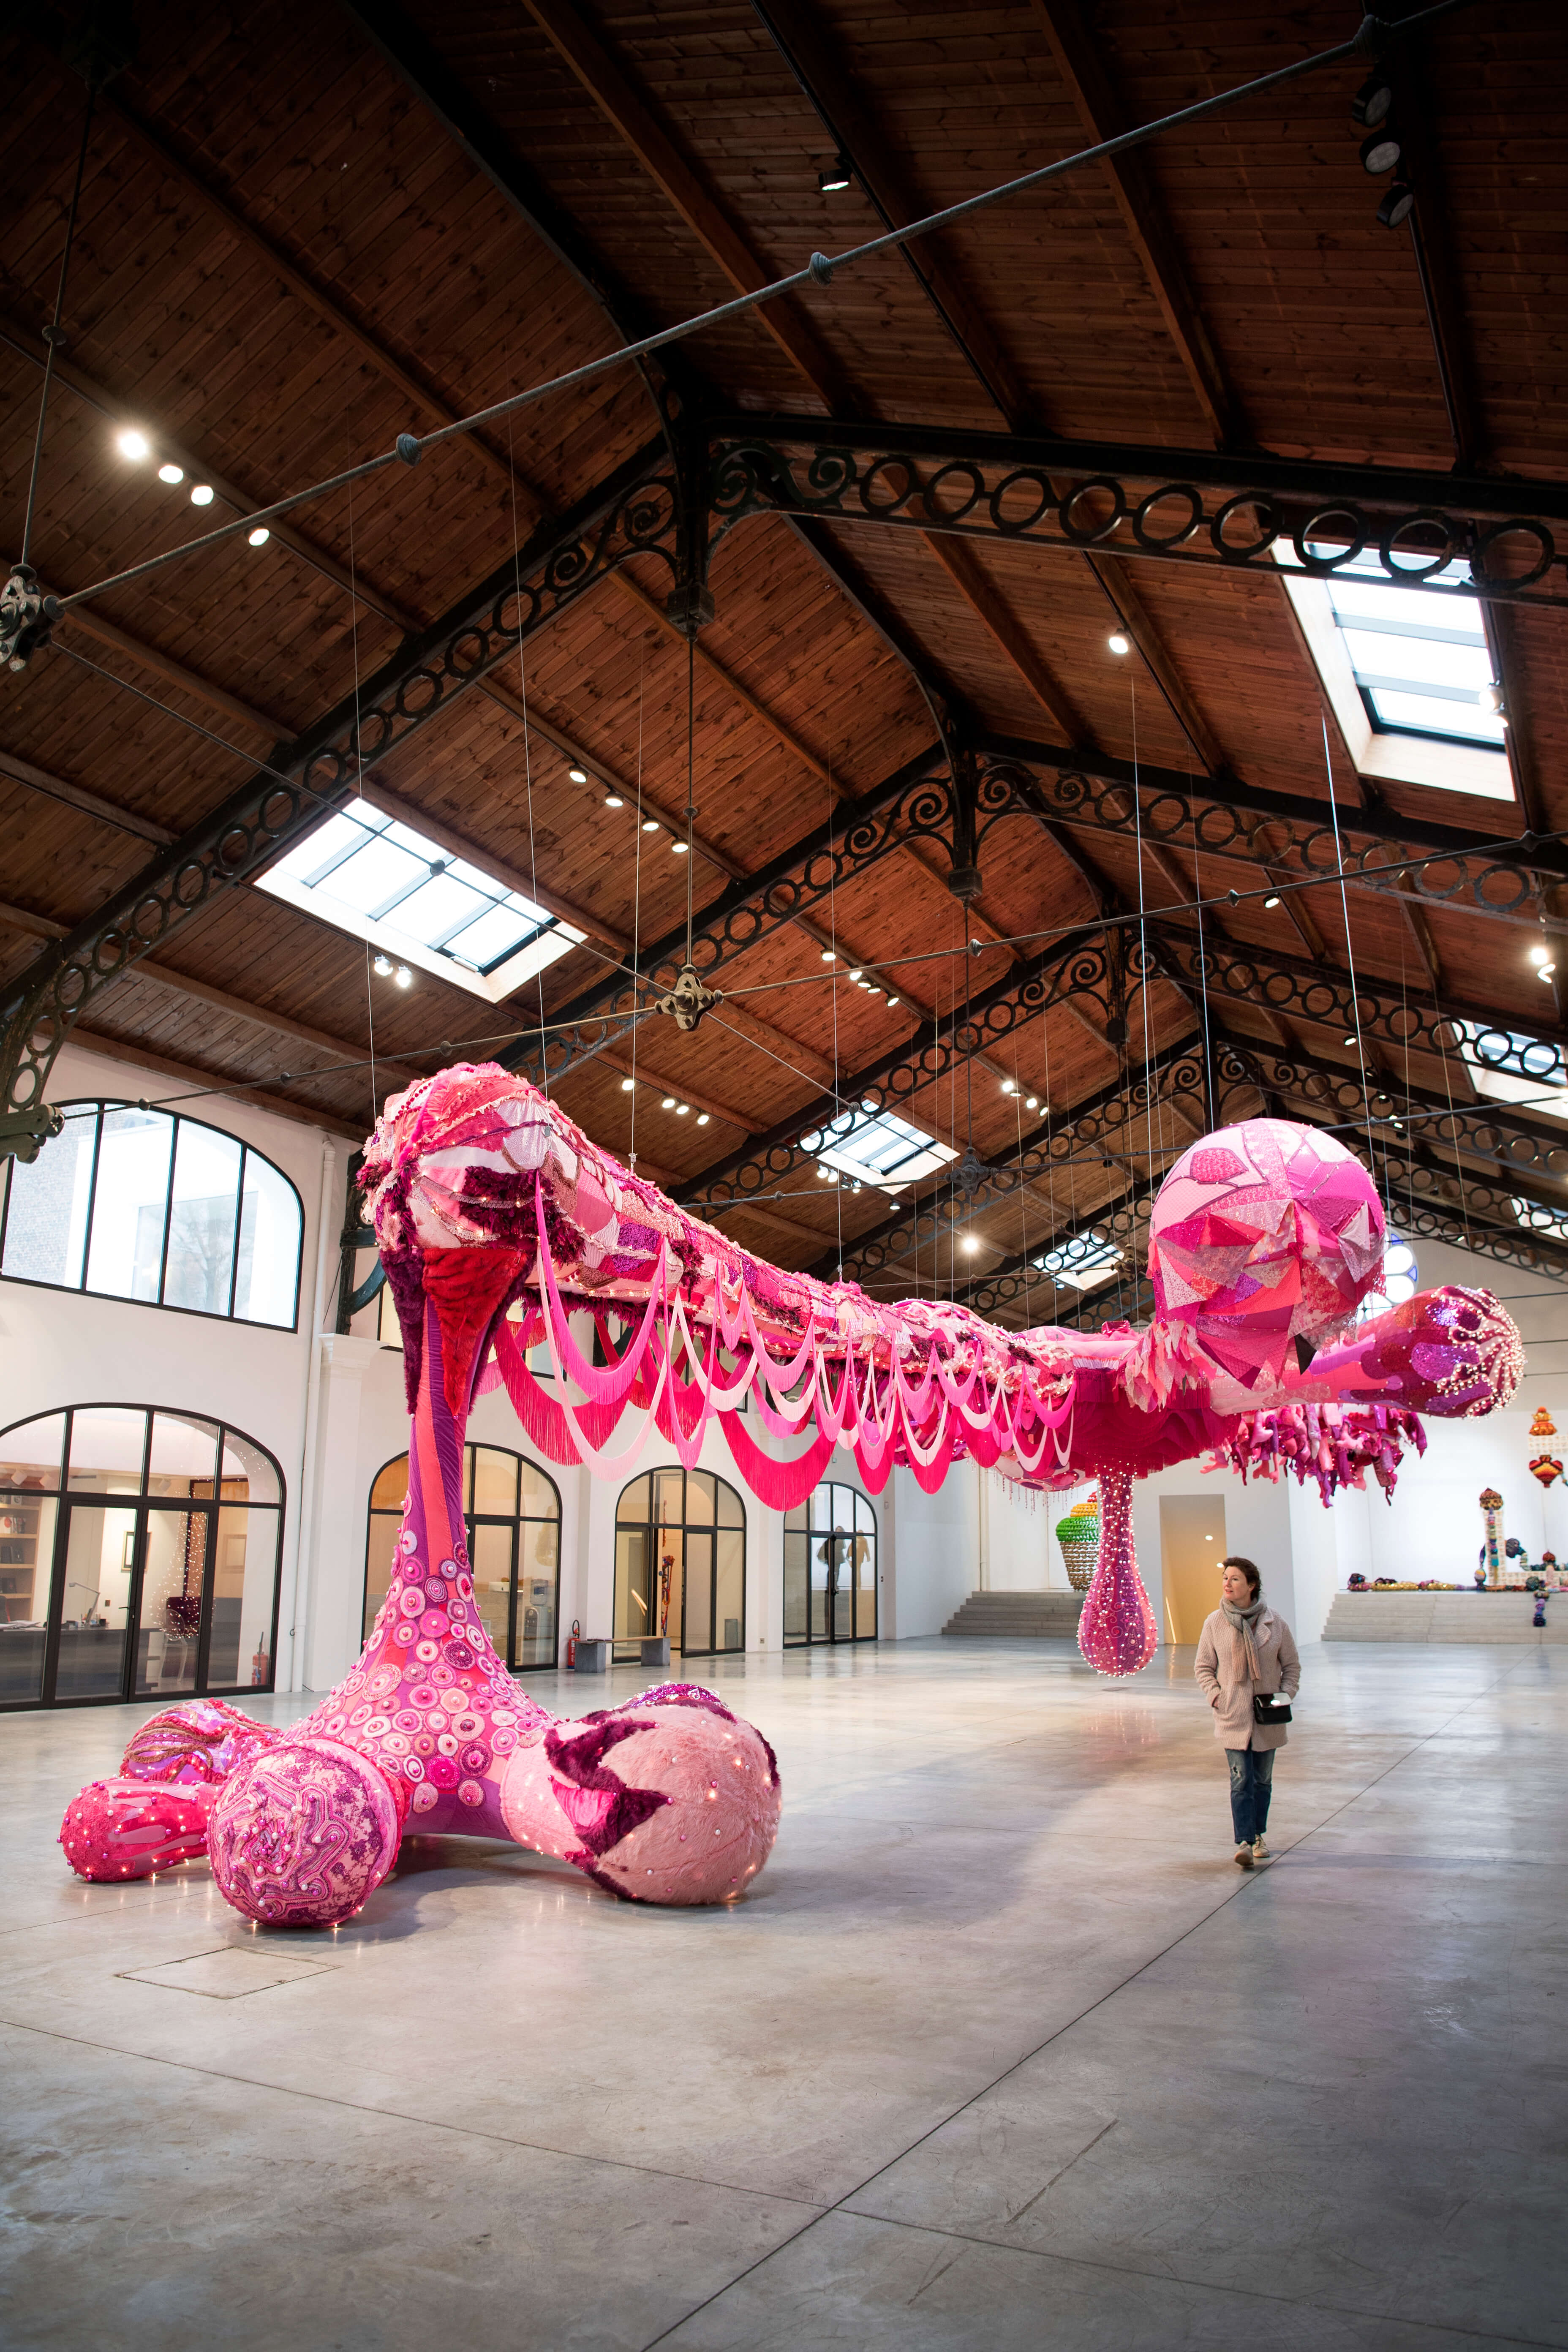 Kunstwerk van Joana Vasconcelos in de Galerij Valerie Bach in Brussel